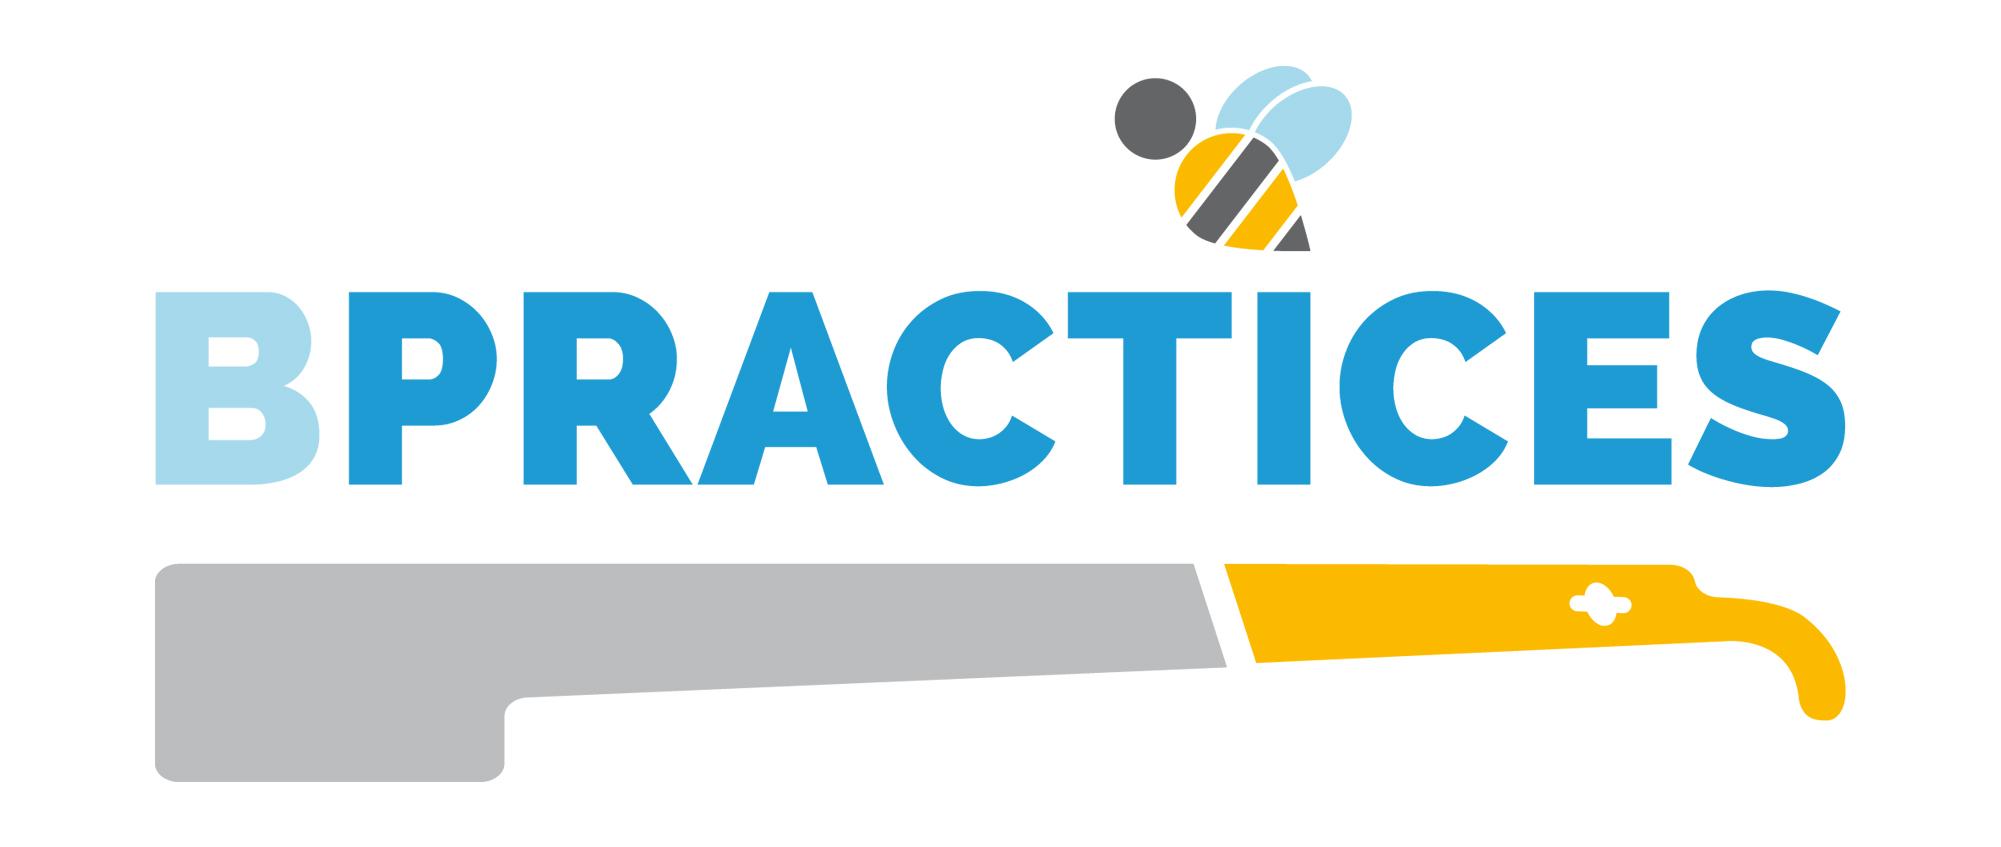 BPRACTICES logo